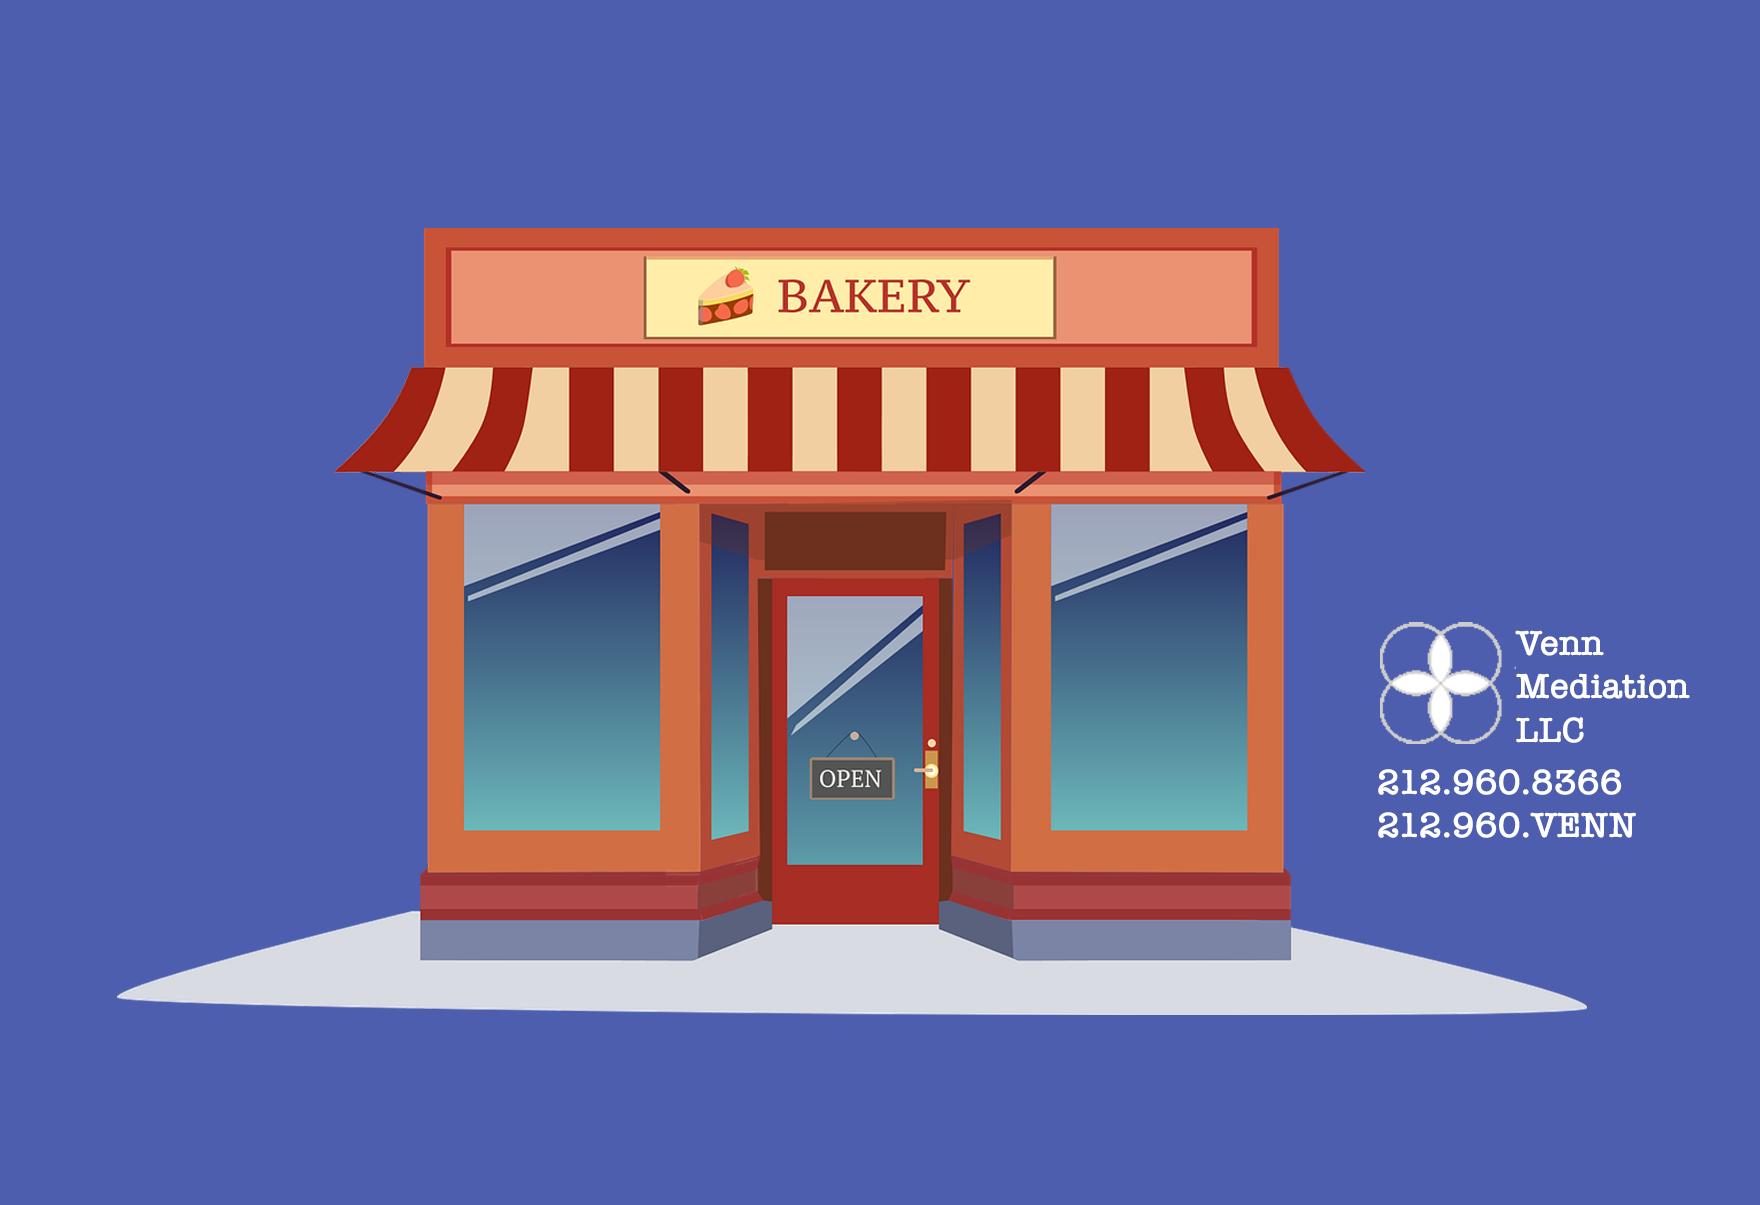 Case Study - Local Bakery Seeking Ingredients